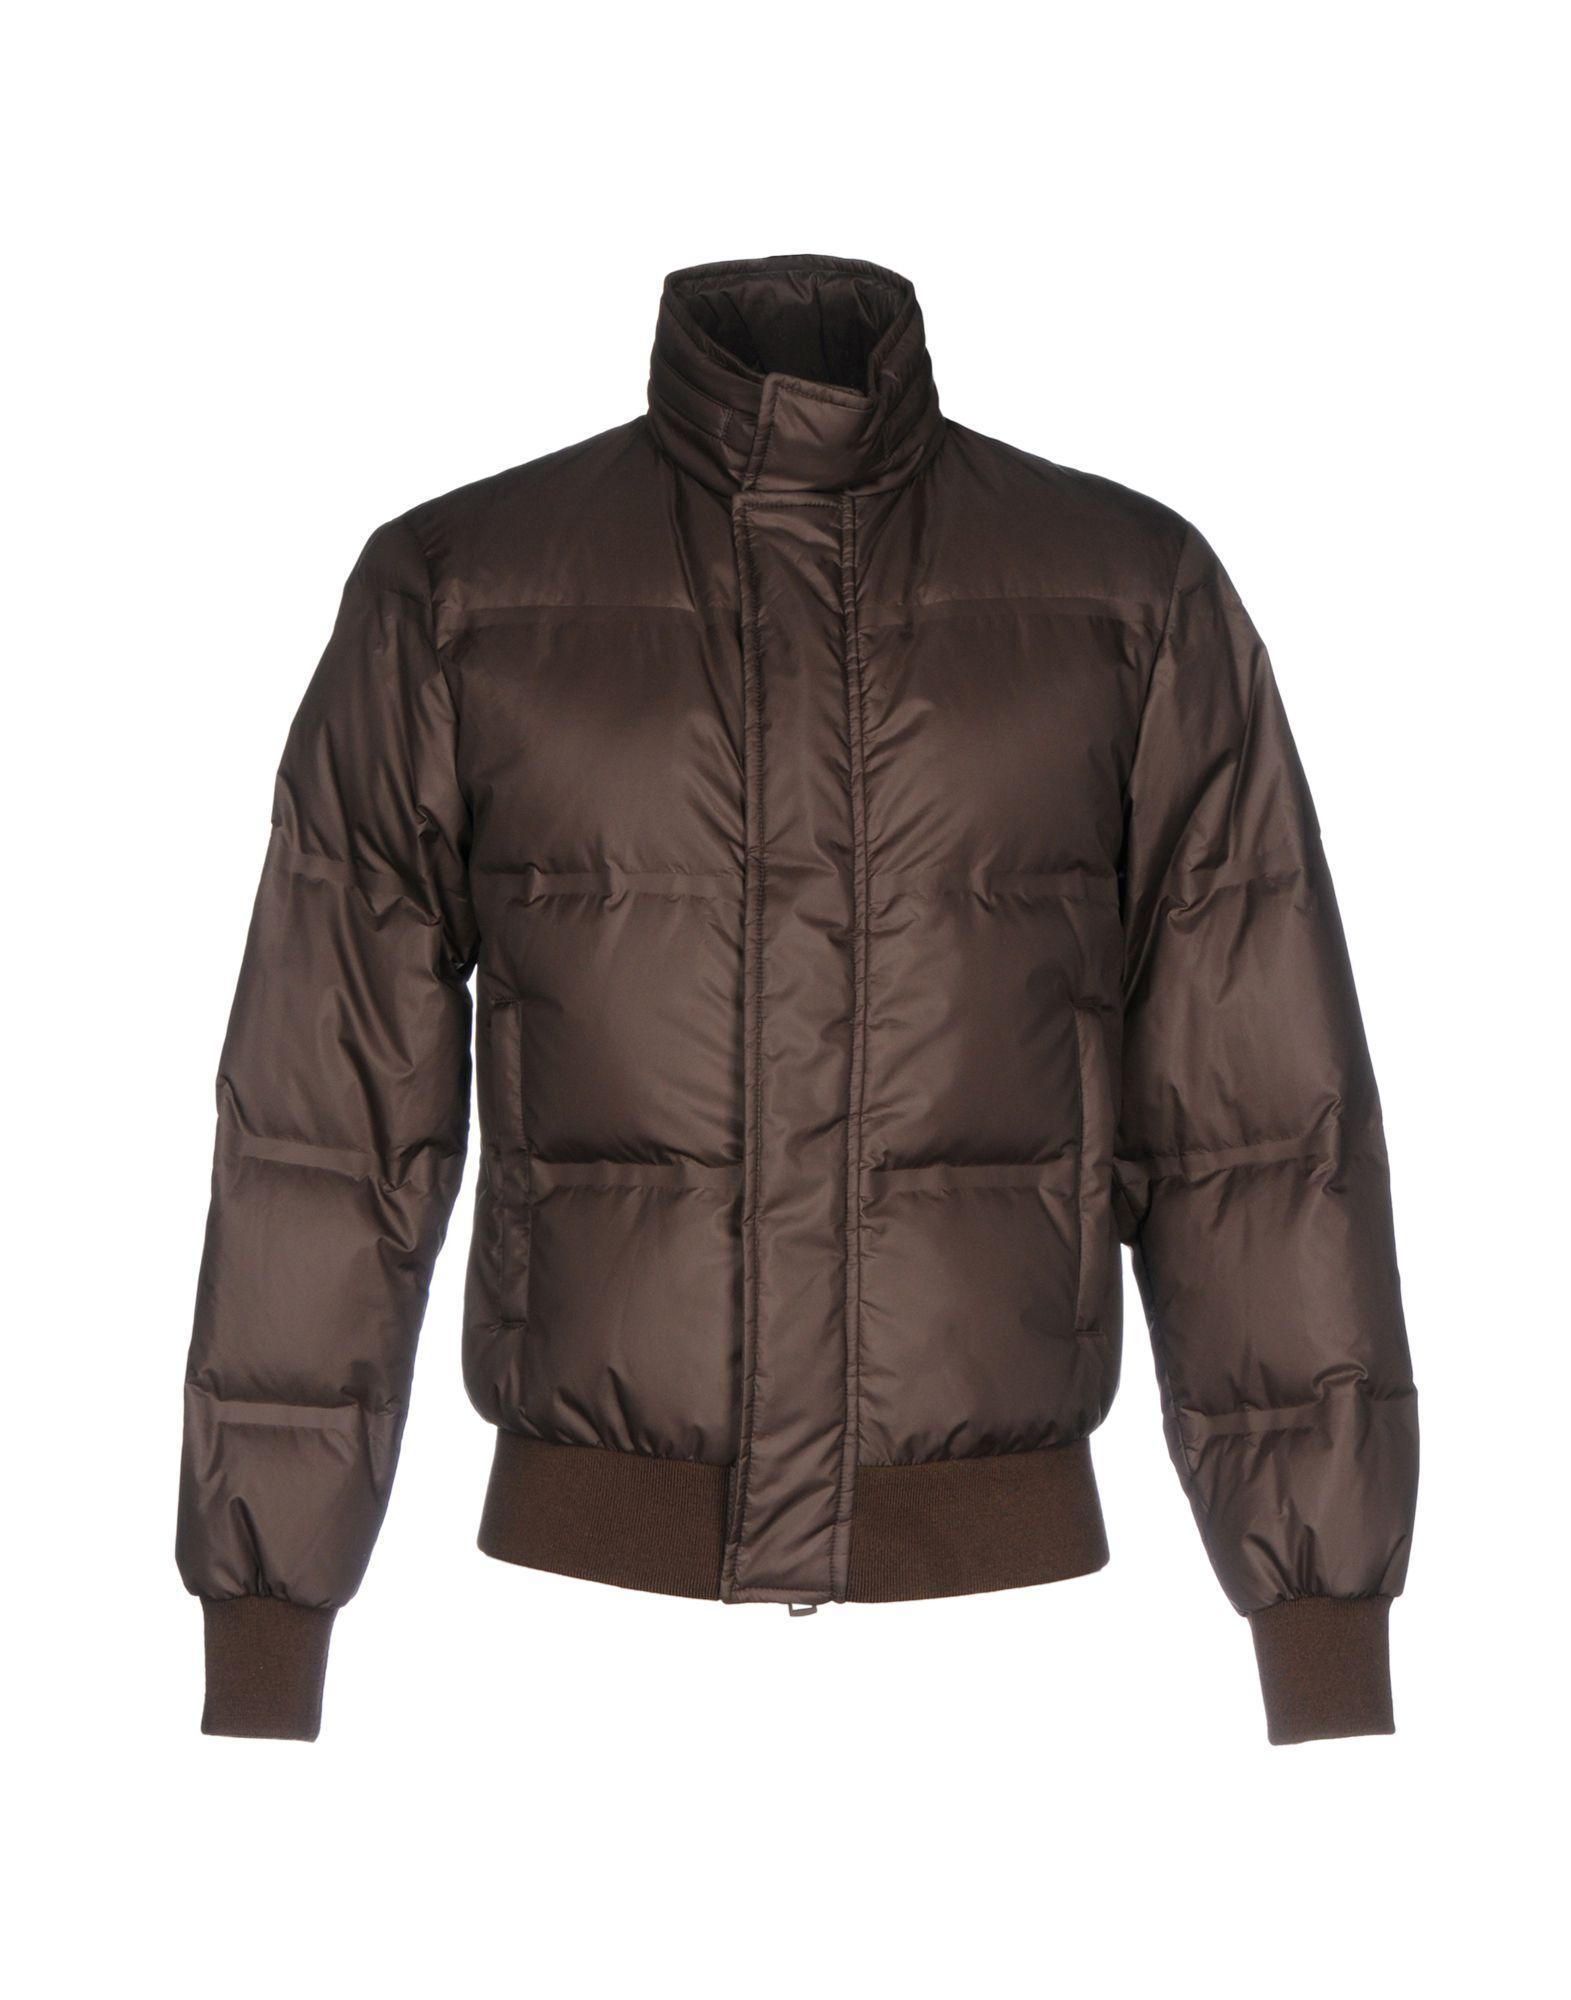 Kired Down Jackets In Dark Brown